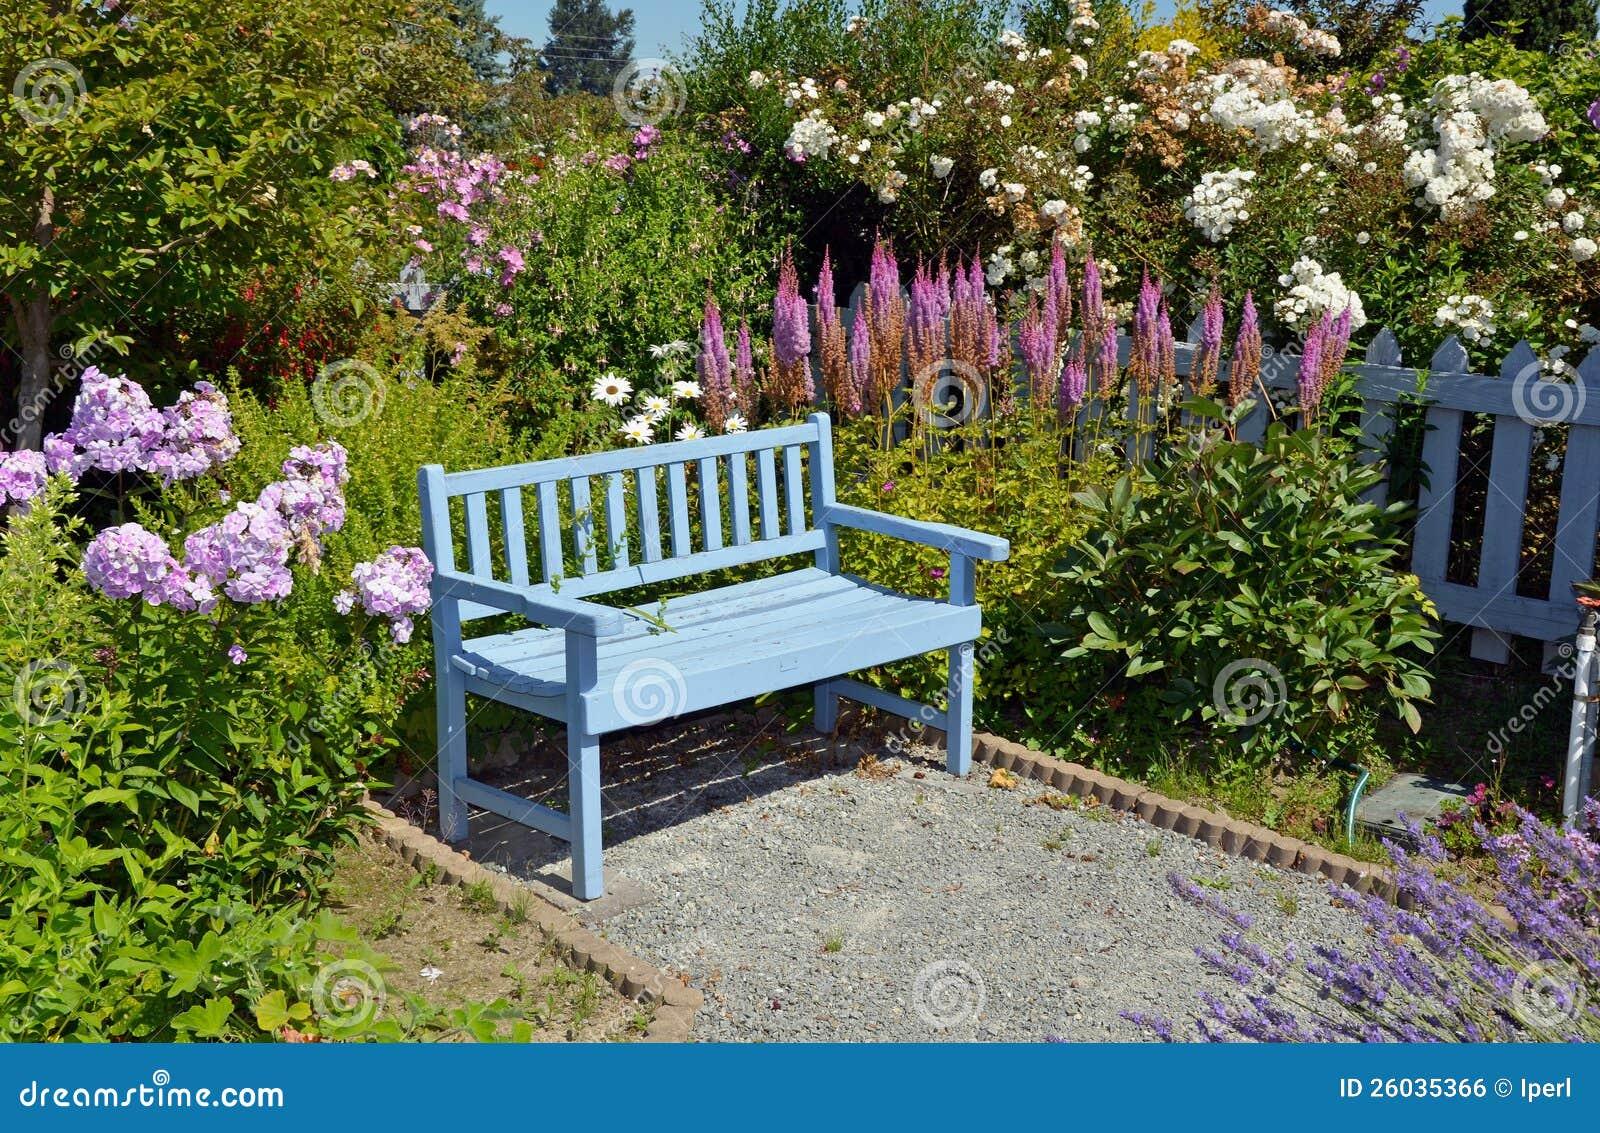 banco de jardim vetor:Blauwe Tuinbank Royalty-vrije Stock Afbeelding – Beeld: 26035366